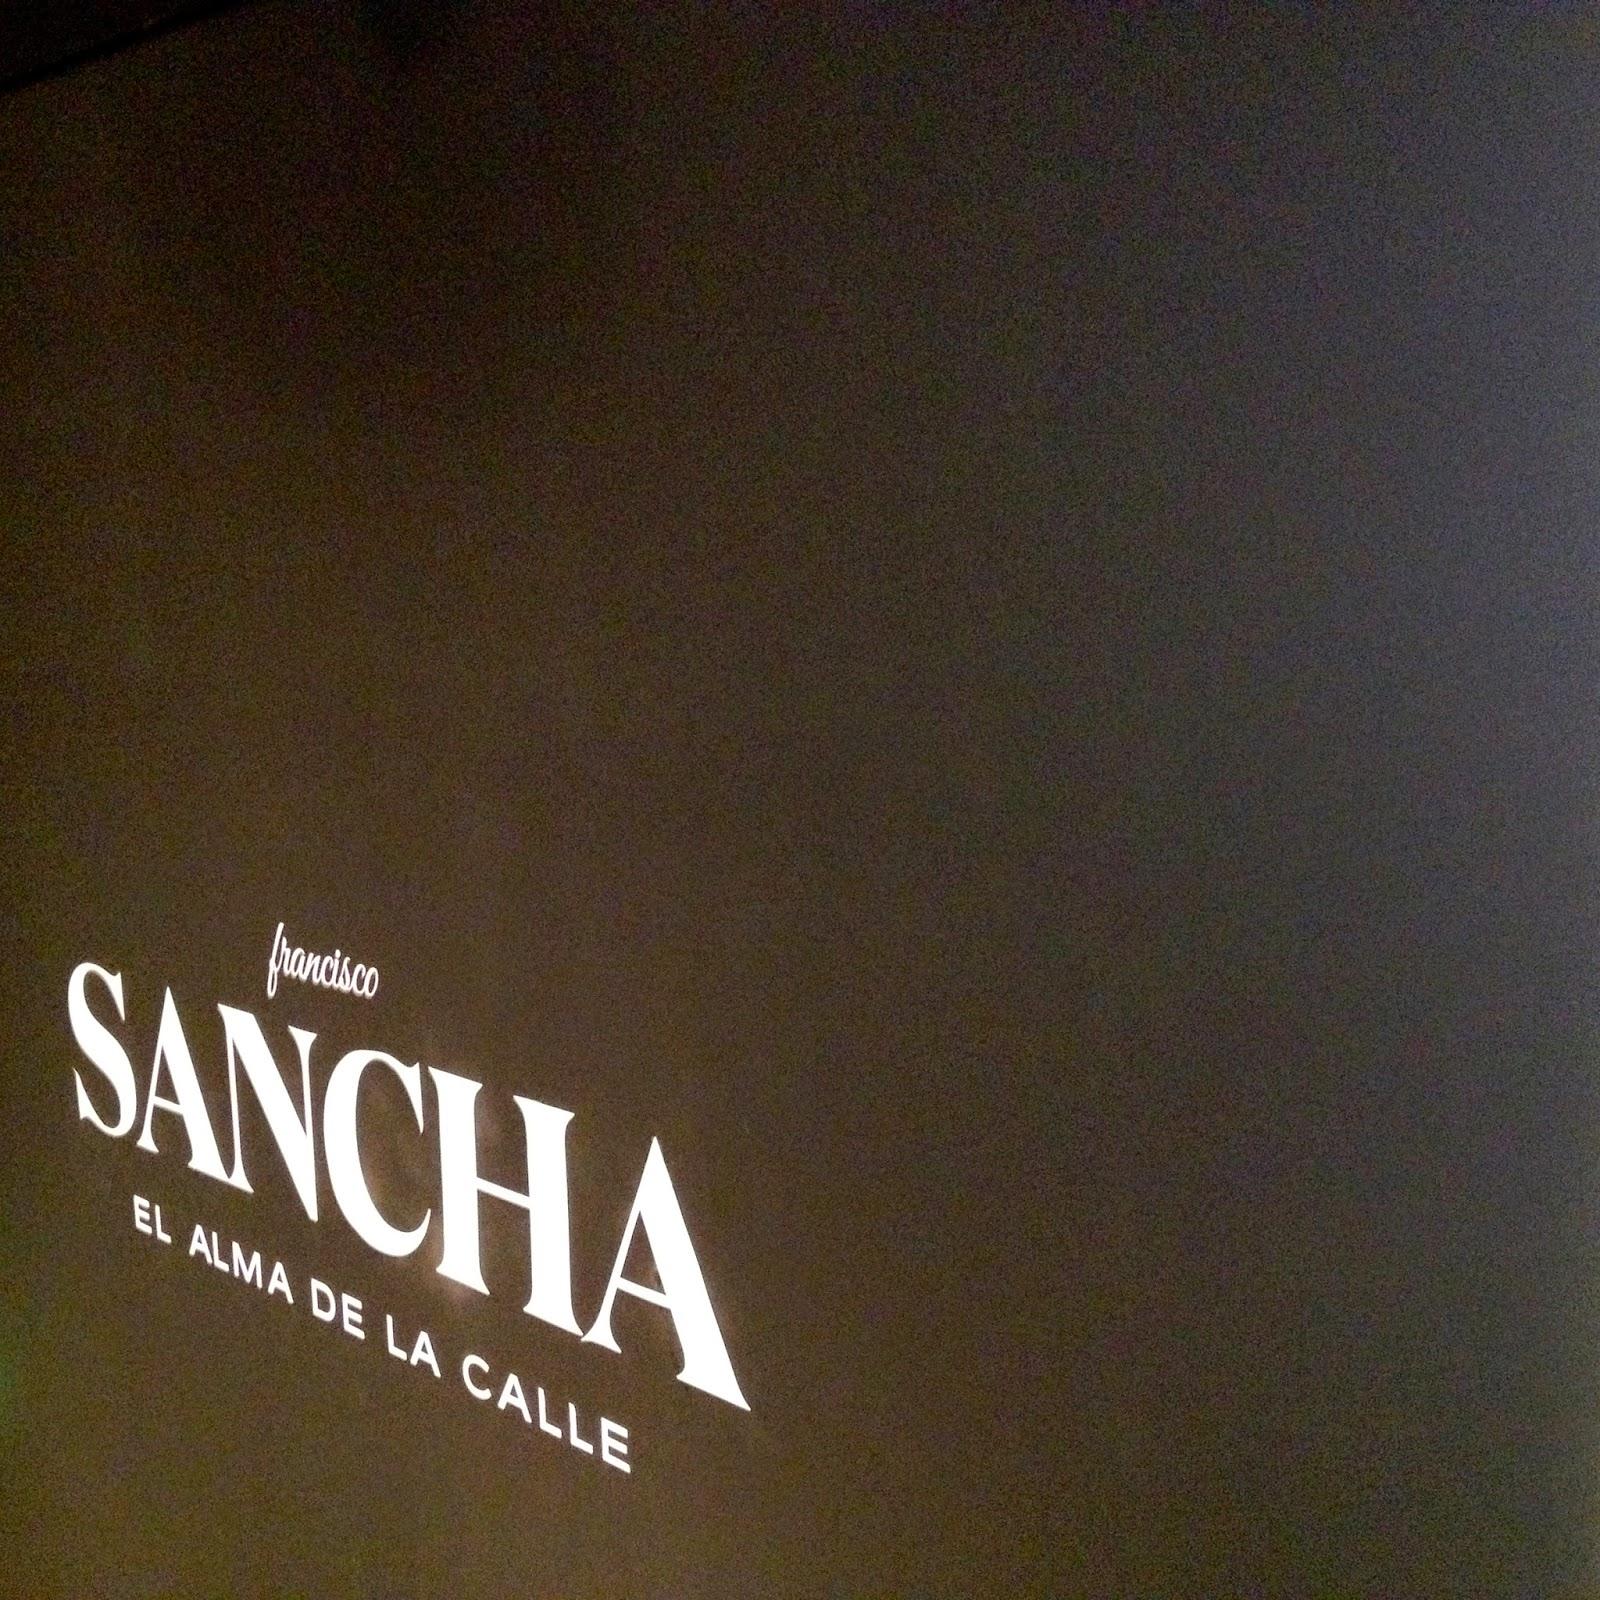 Museo ABC de Dibujo e Ilustración - francisco sancha